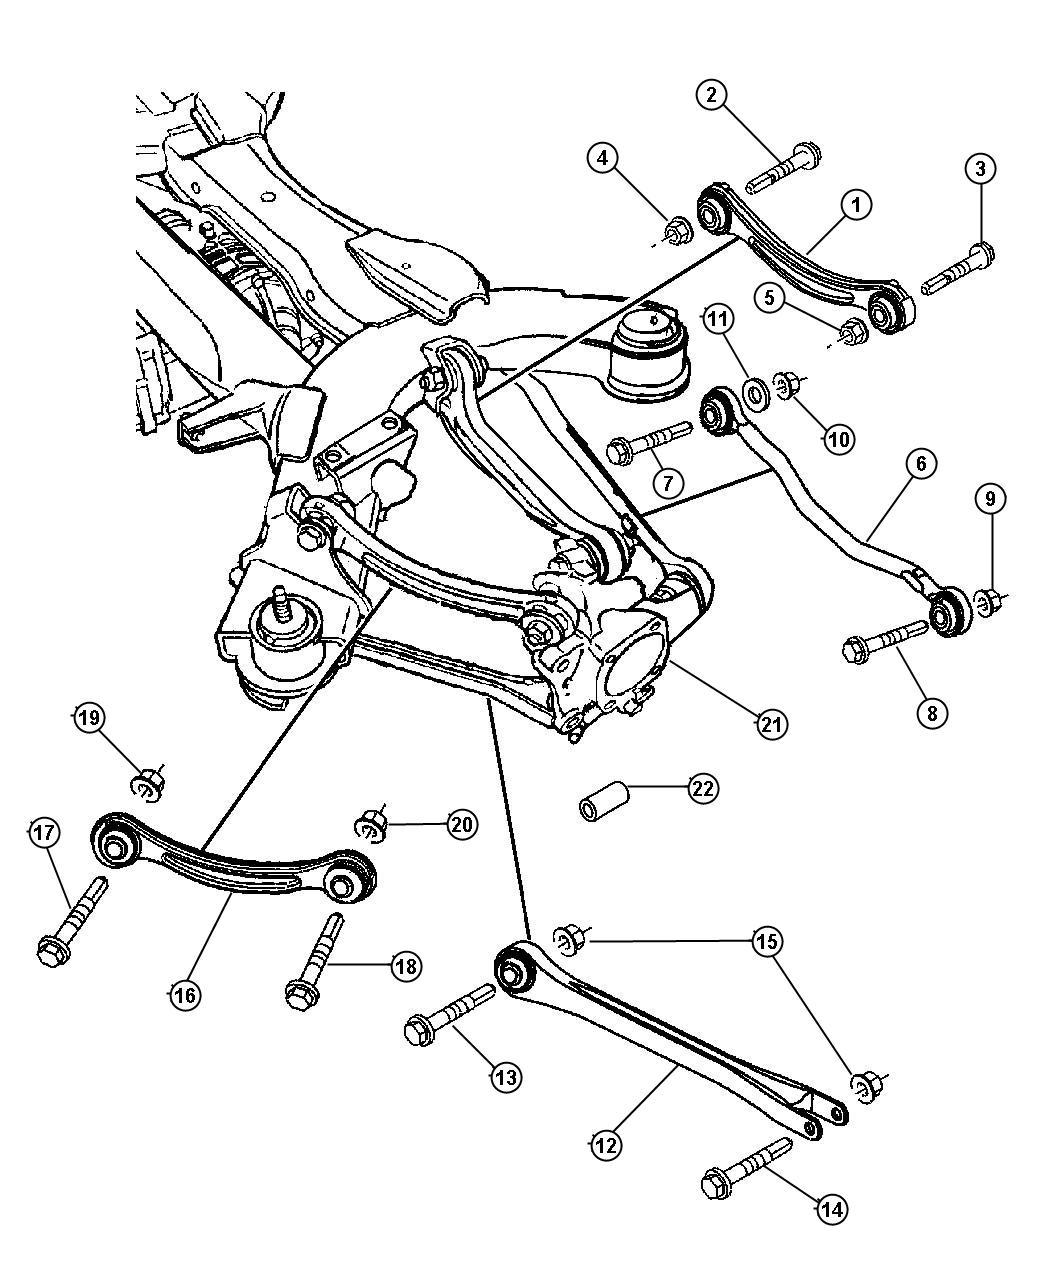 Chrysler Pacifica Rear Suspension Diagram